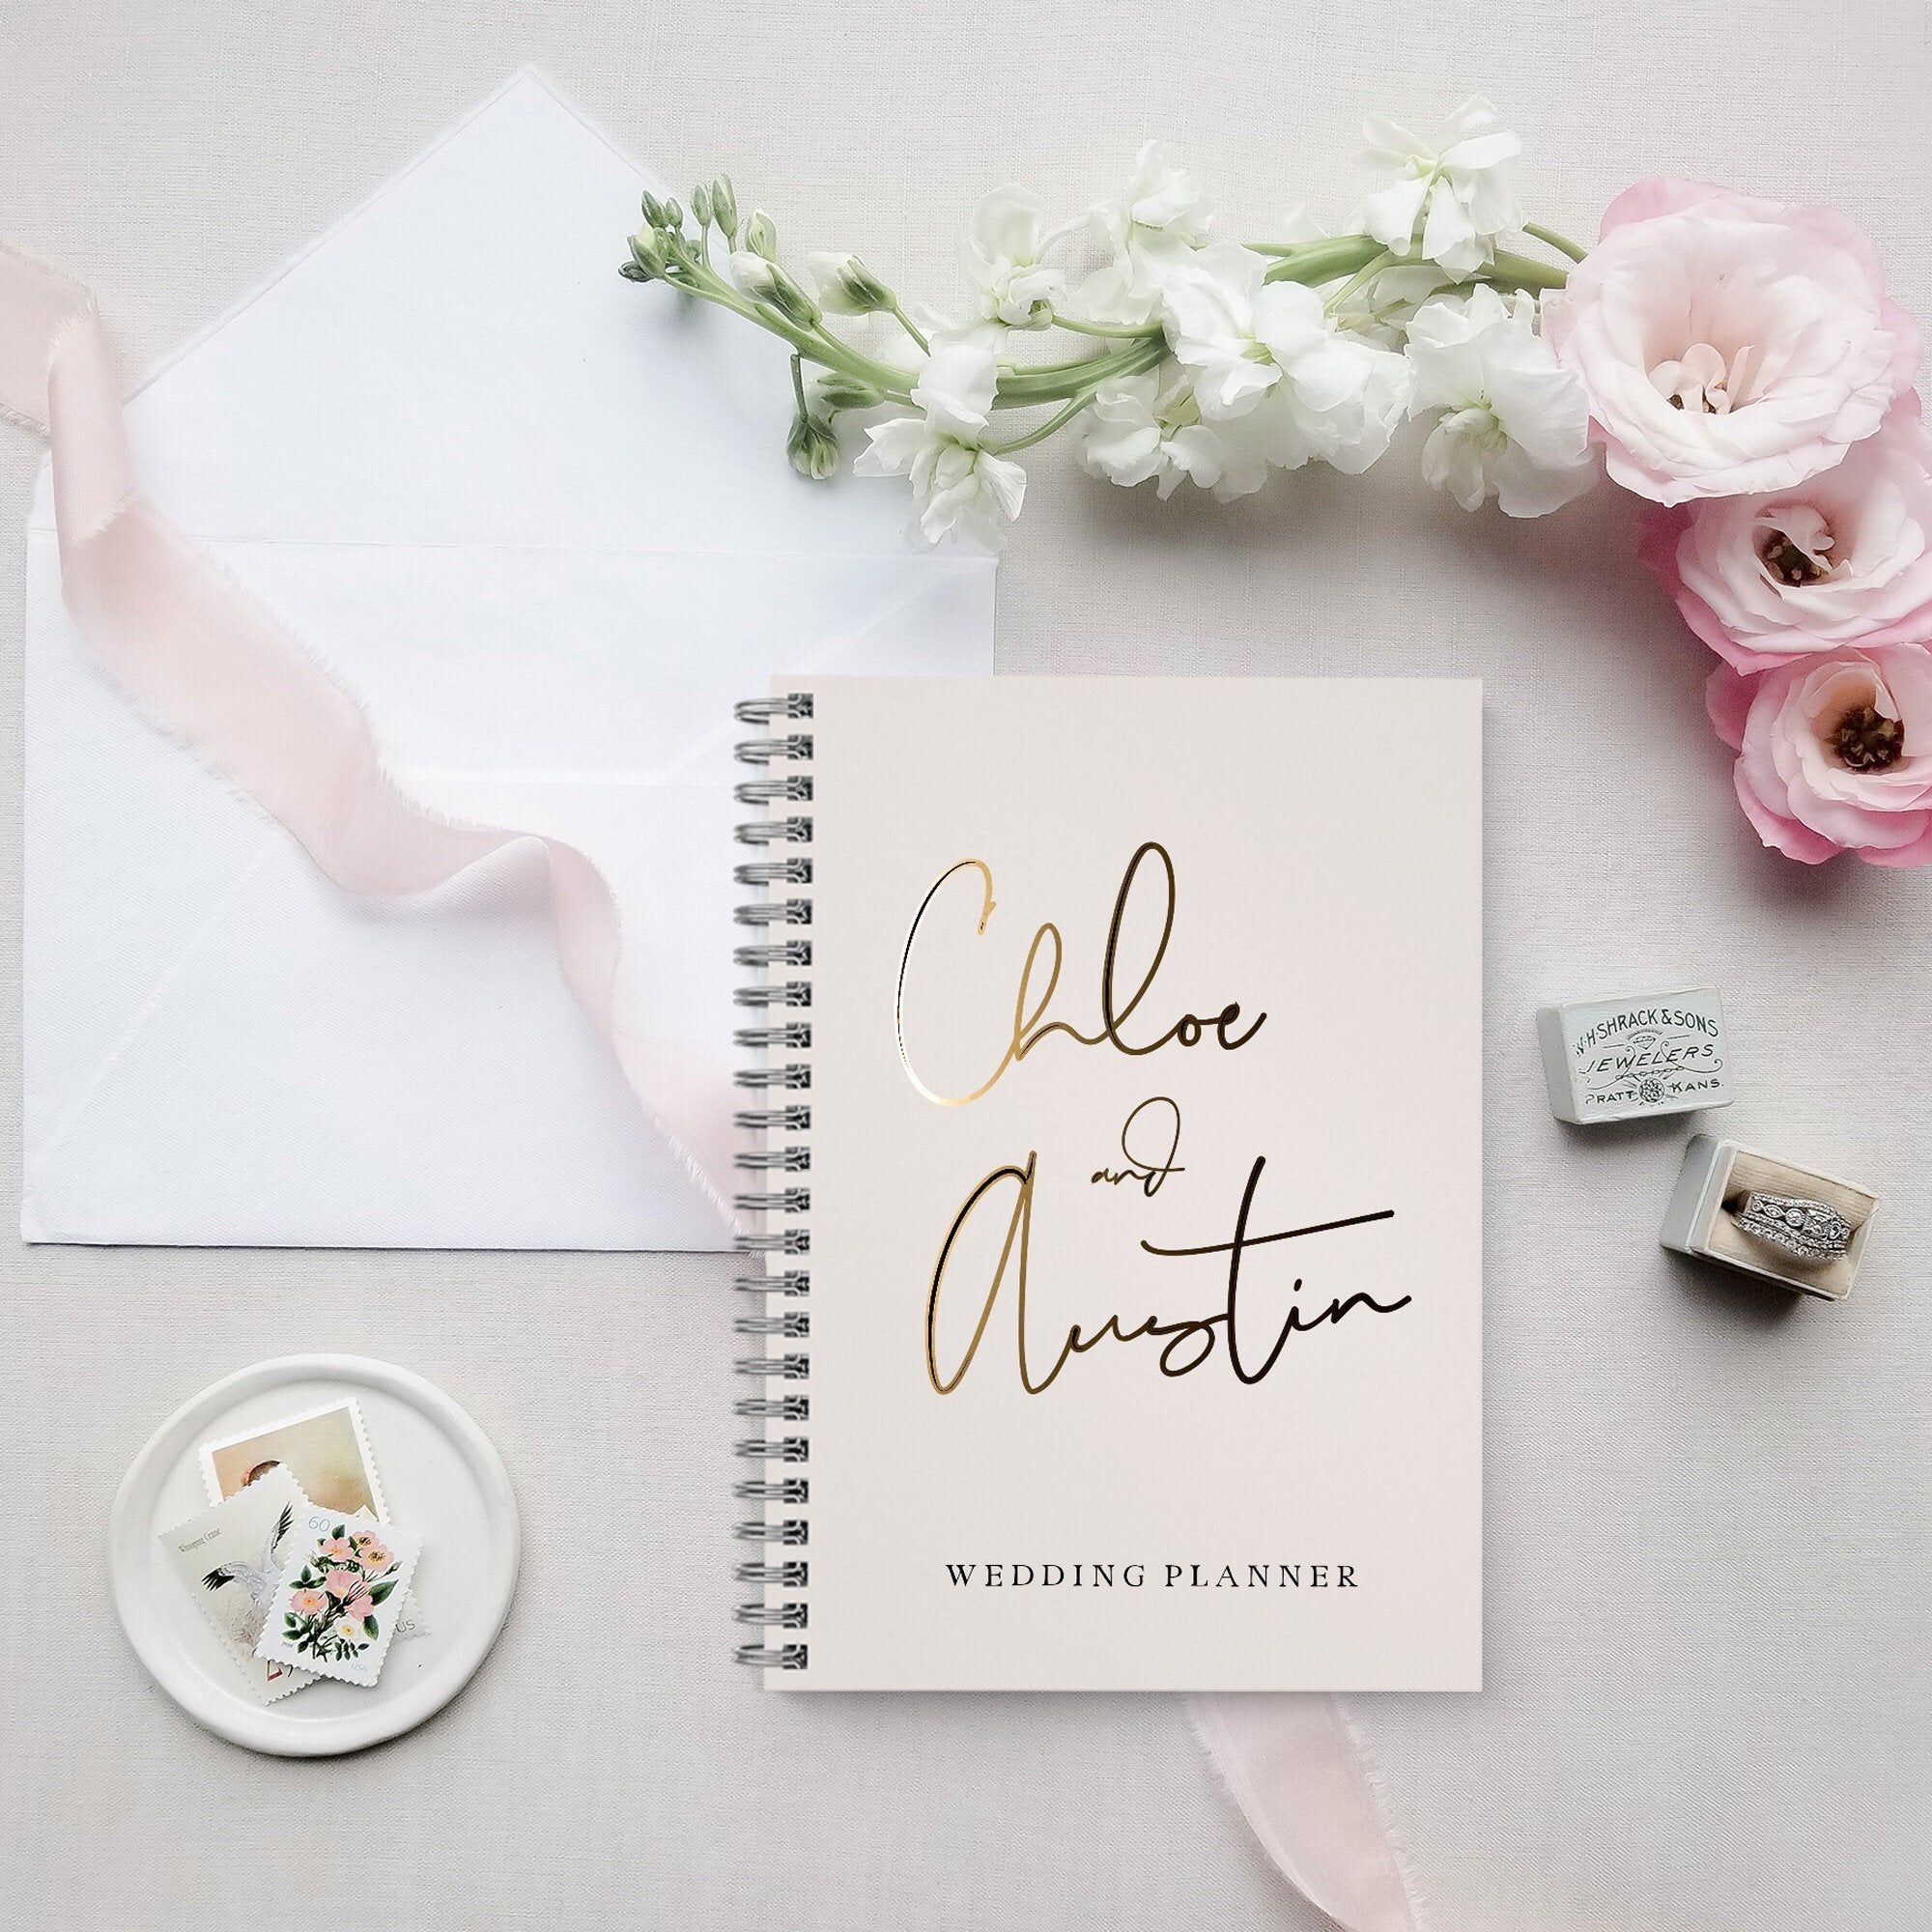 Blush Watercolor Wedding Planner Book Custom Wedding Planner | Etsy | Personalized wedding ...